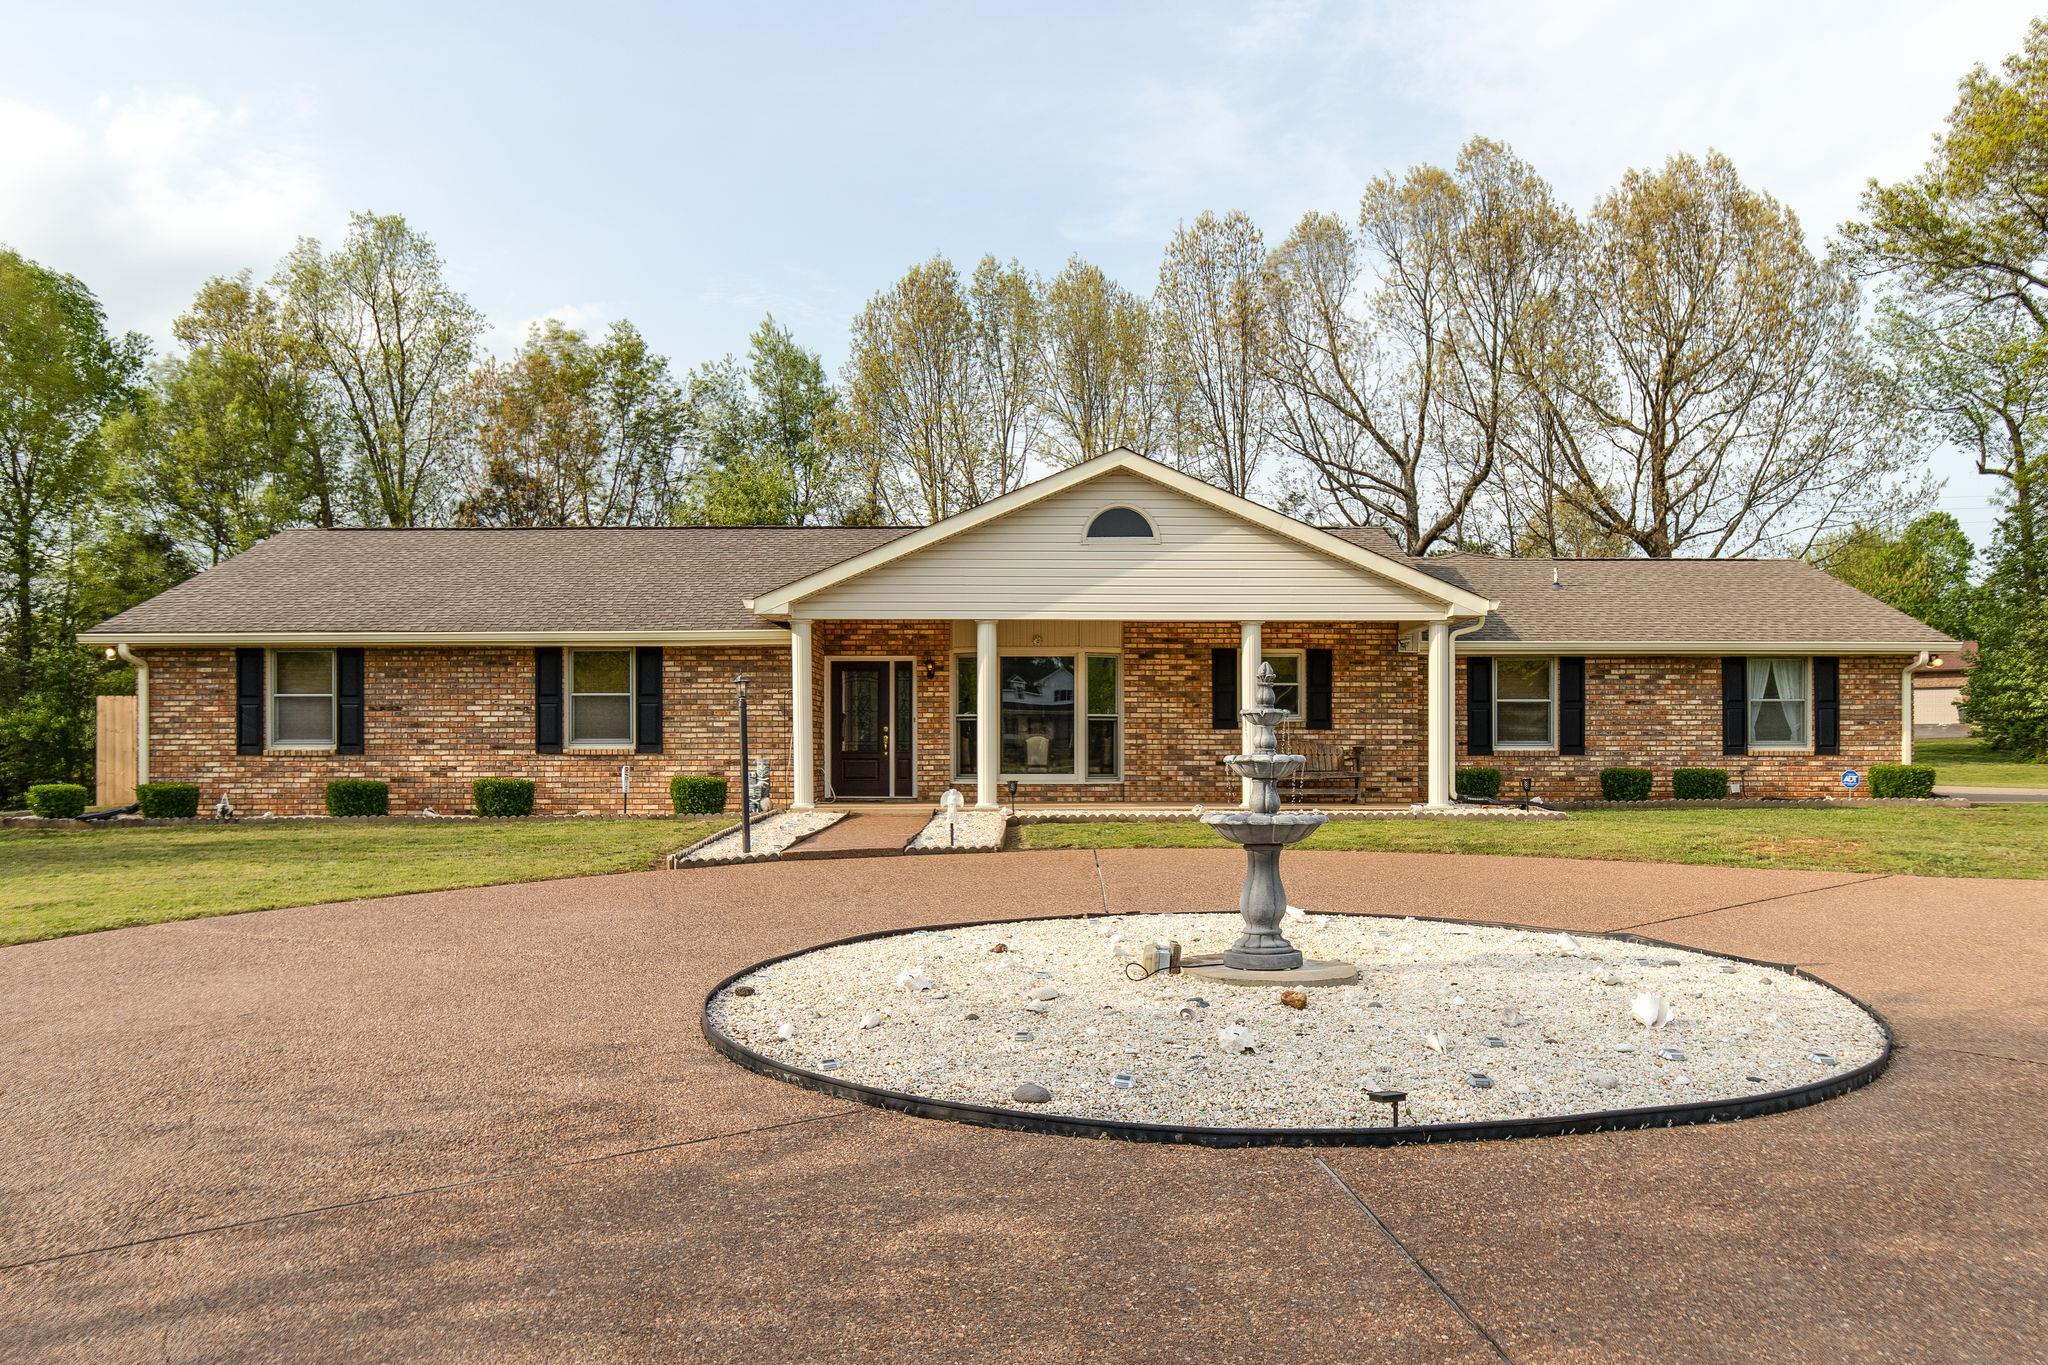 3001 Southwark Dr, Springfield, TN 37172 - Springfield, TN real estate listing